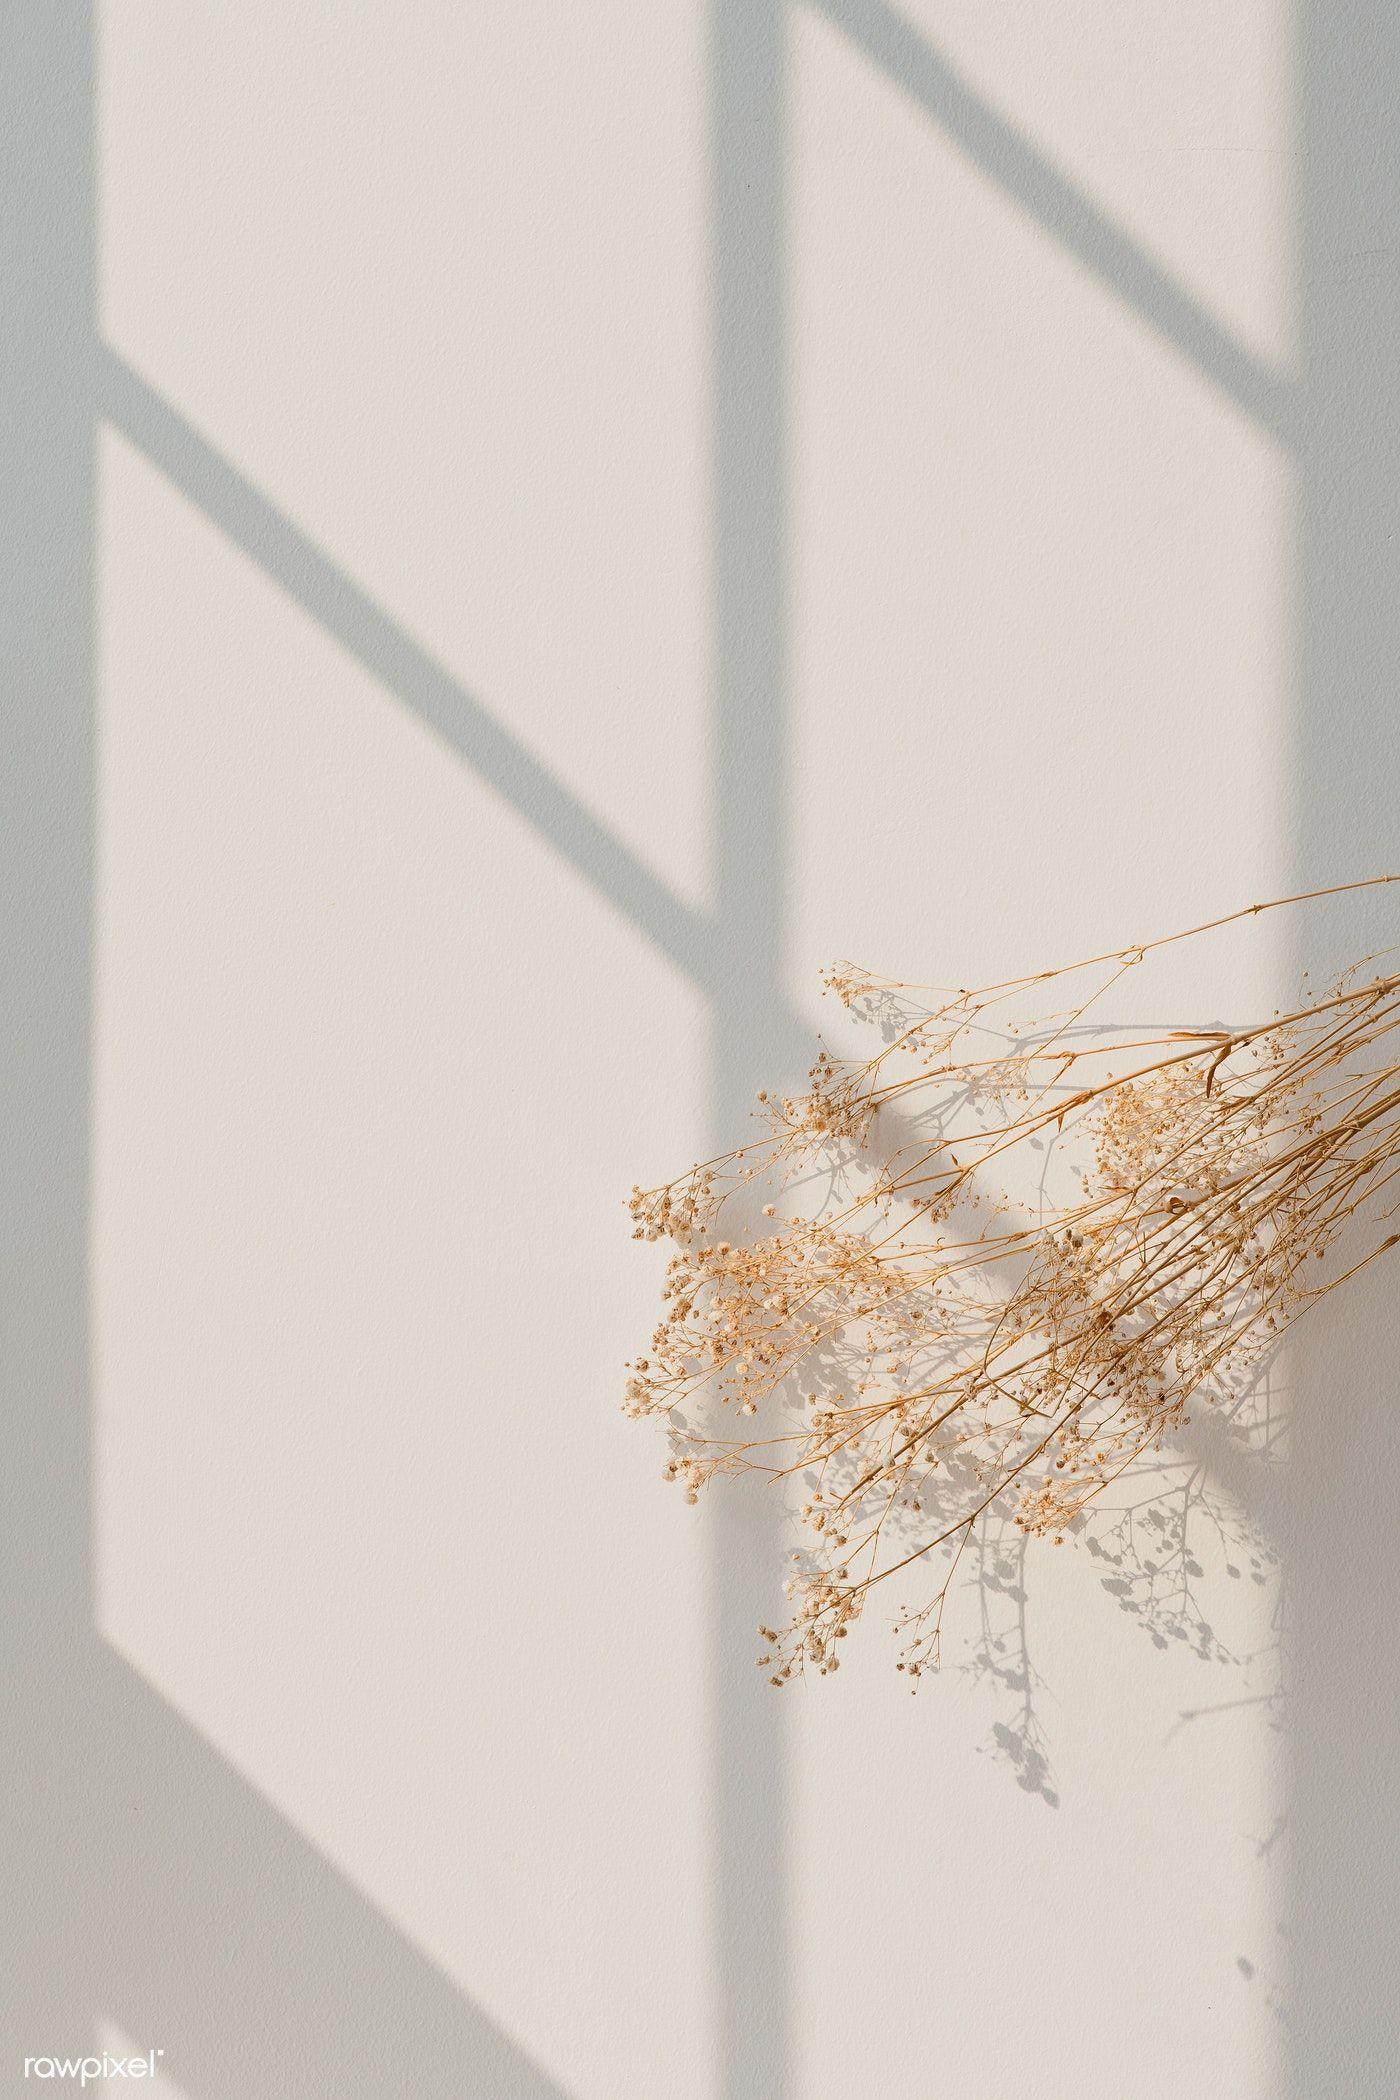 premium image of dried gypsophila with window